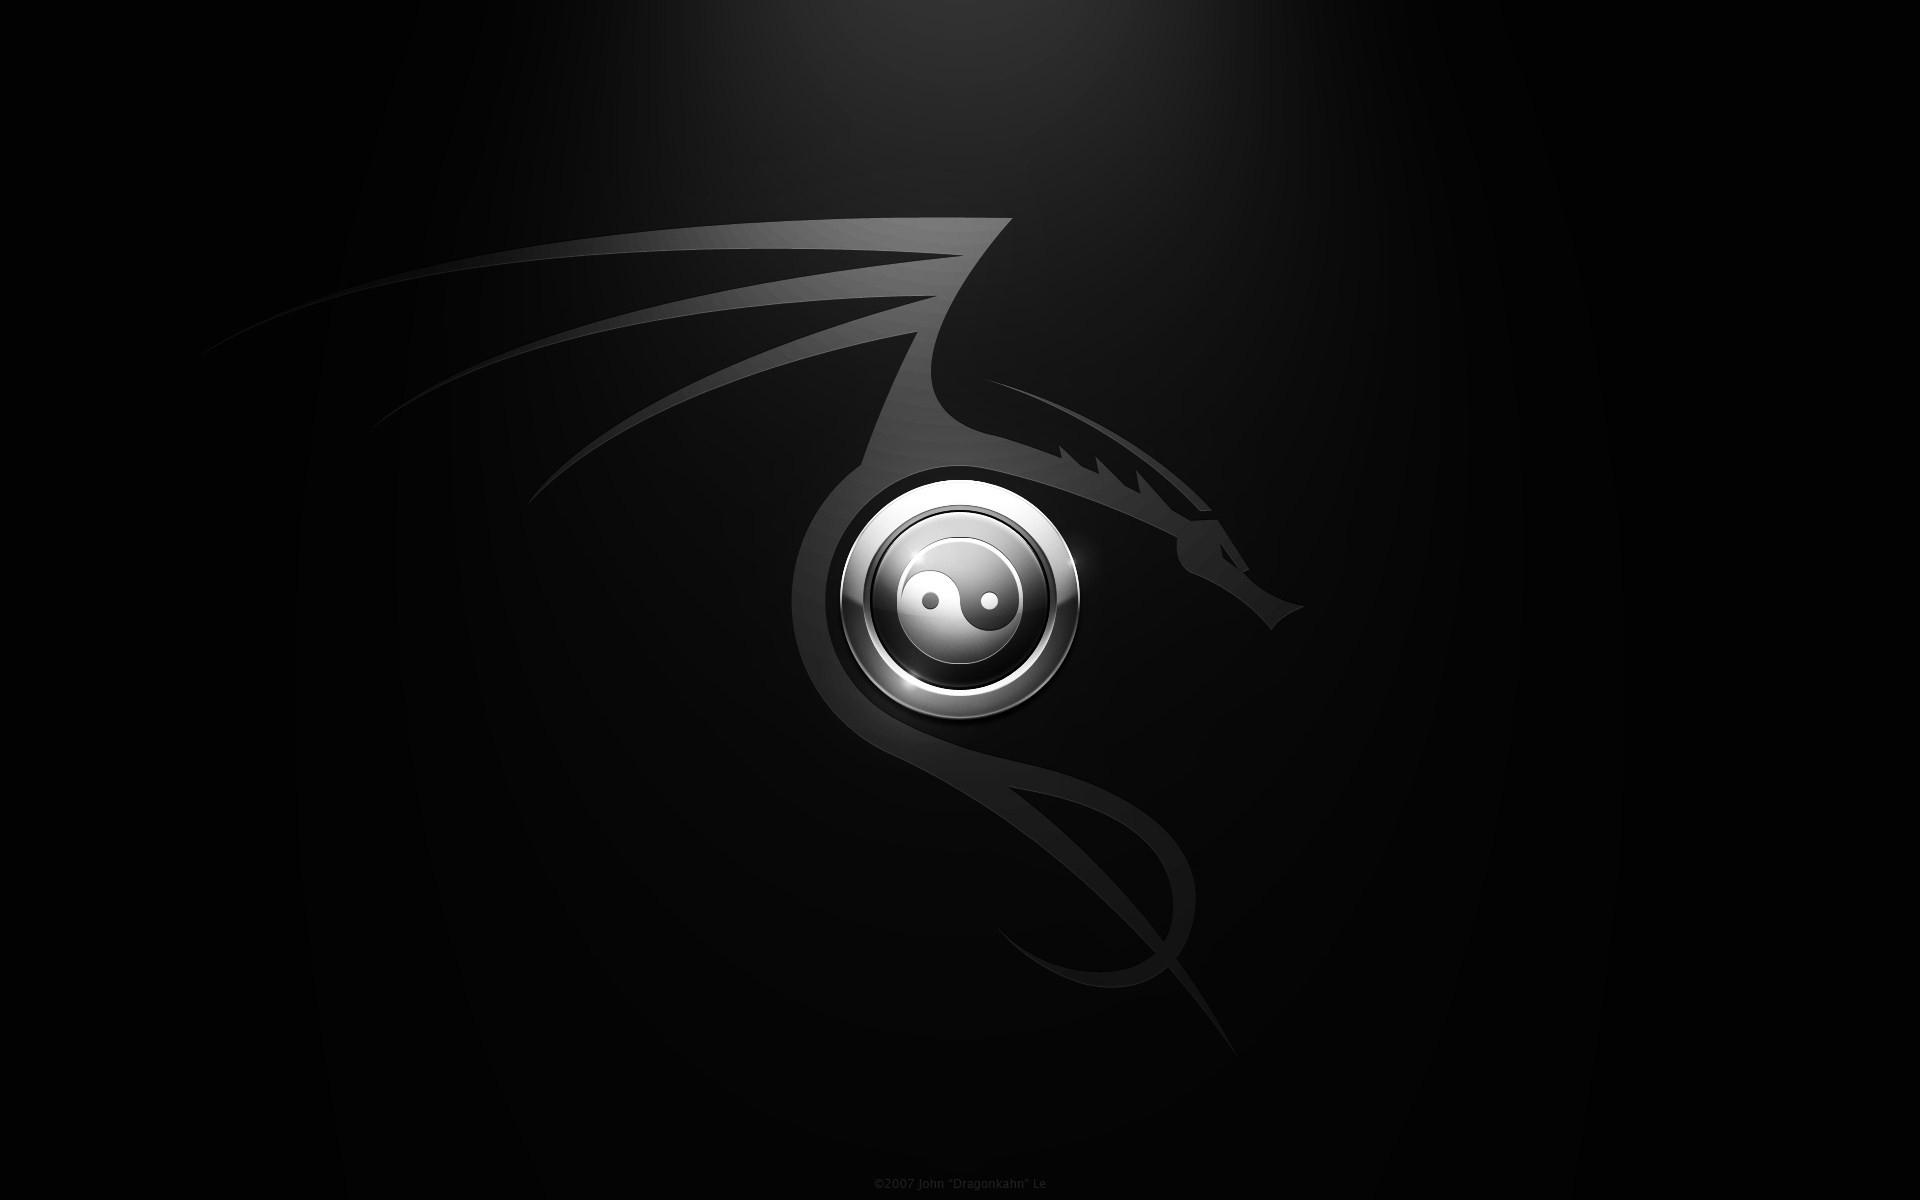 dragon yin yang wallpaper (51+ images)